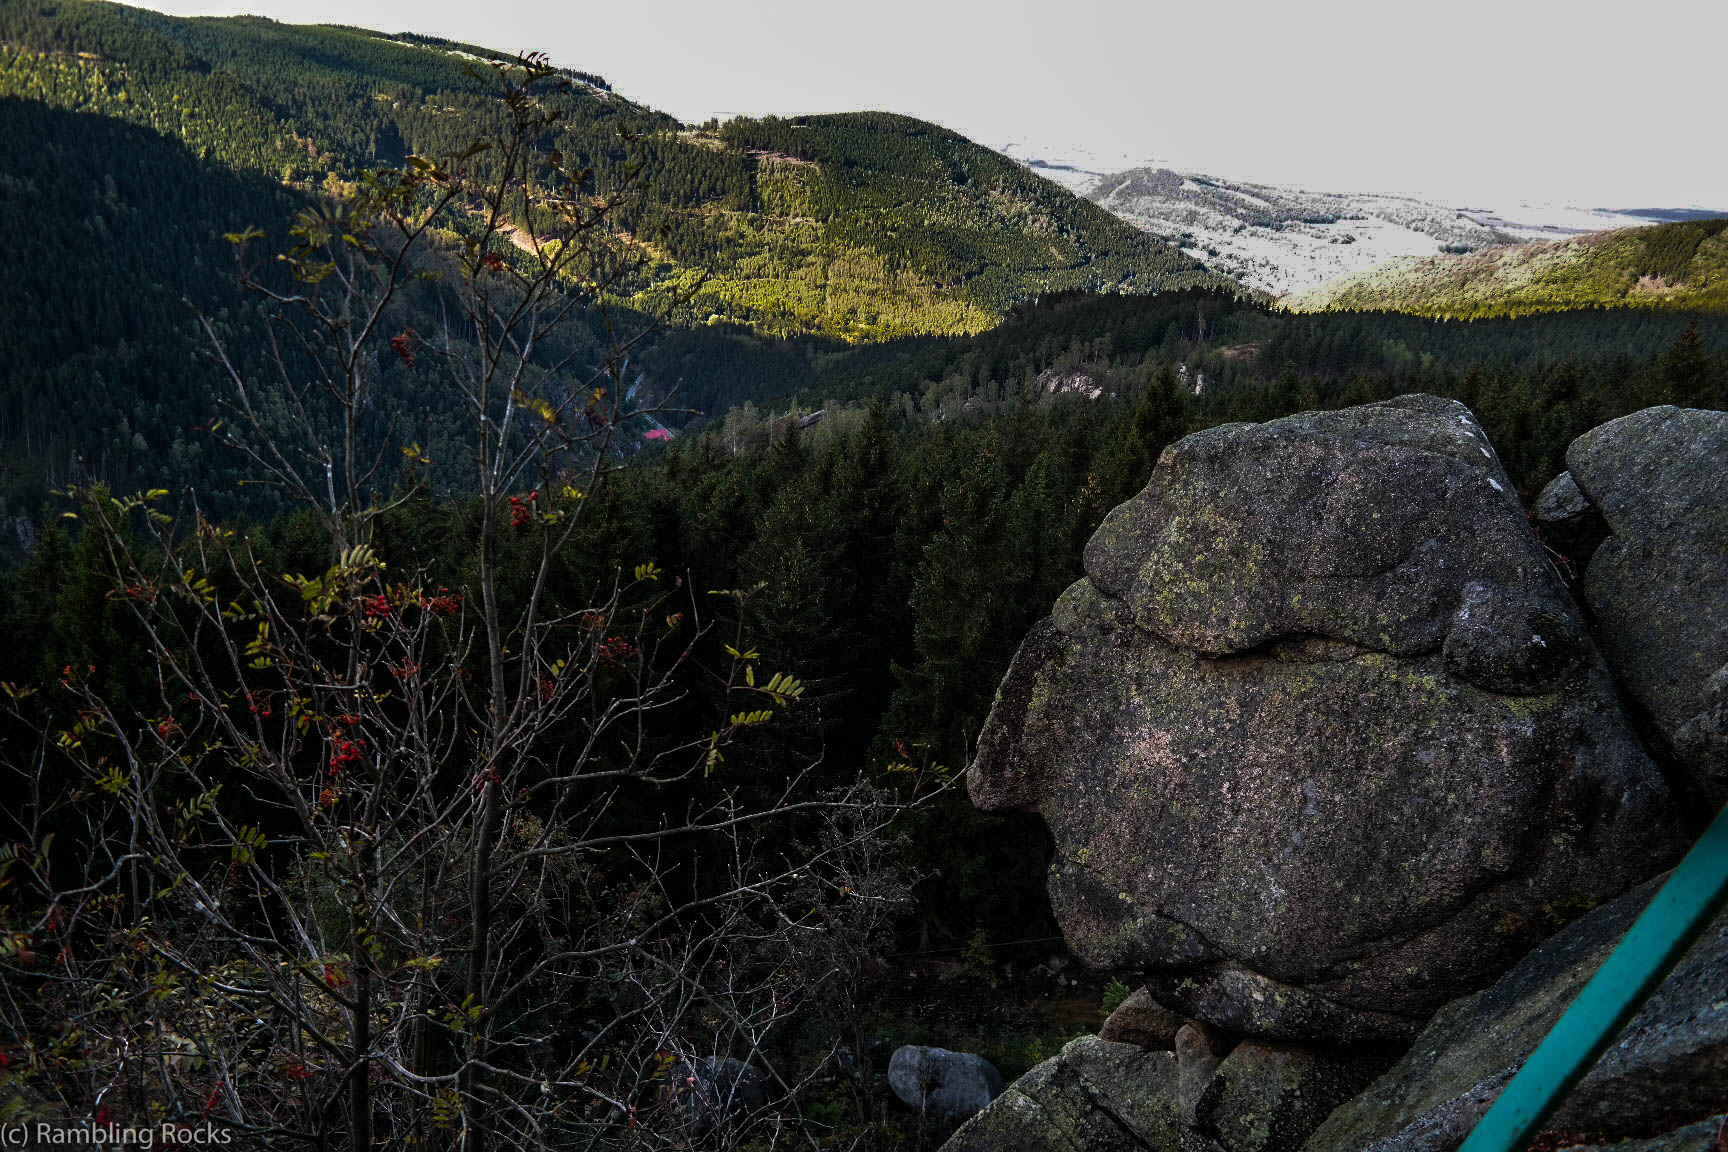 Alte vom Berge